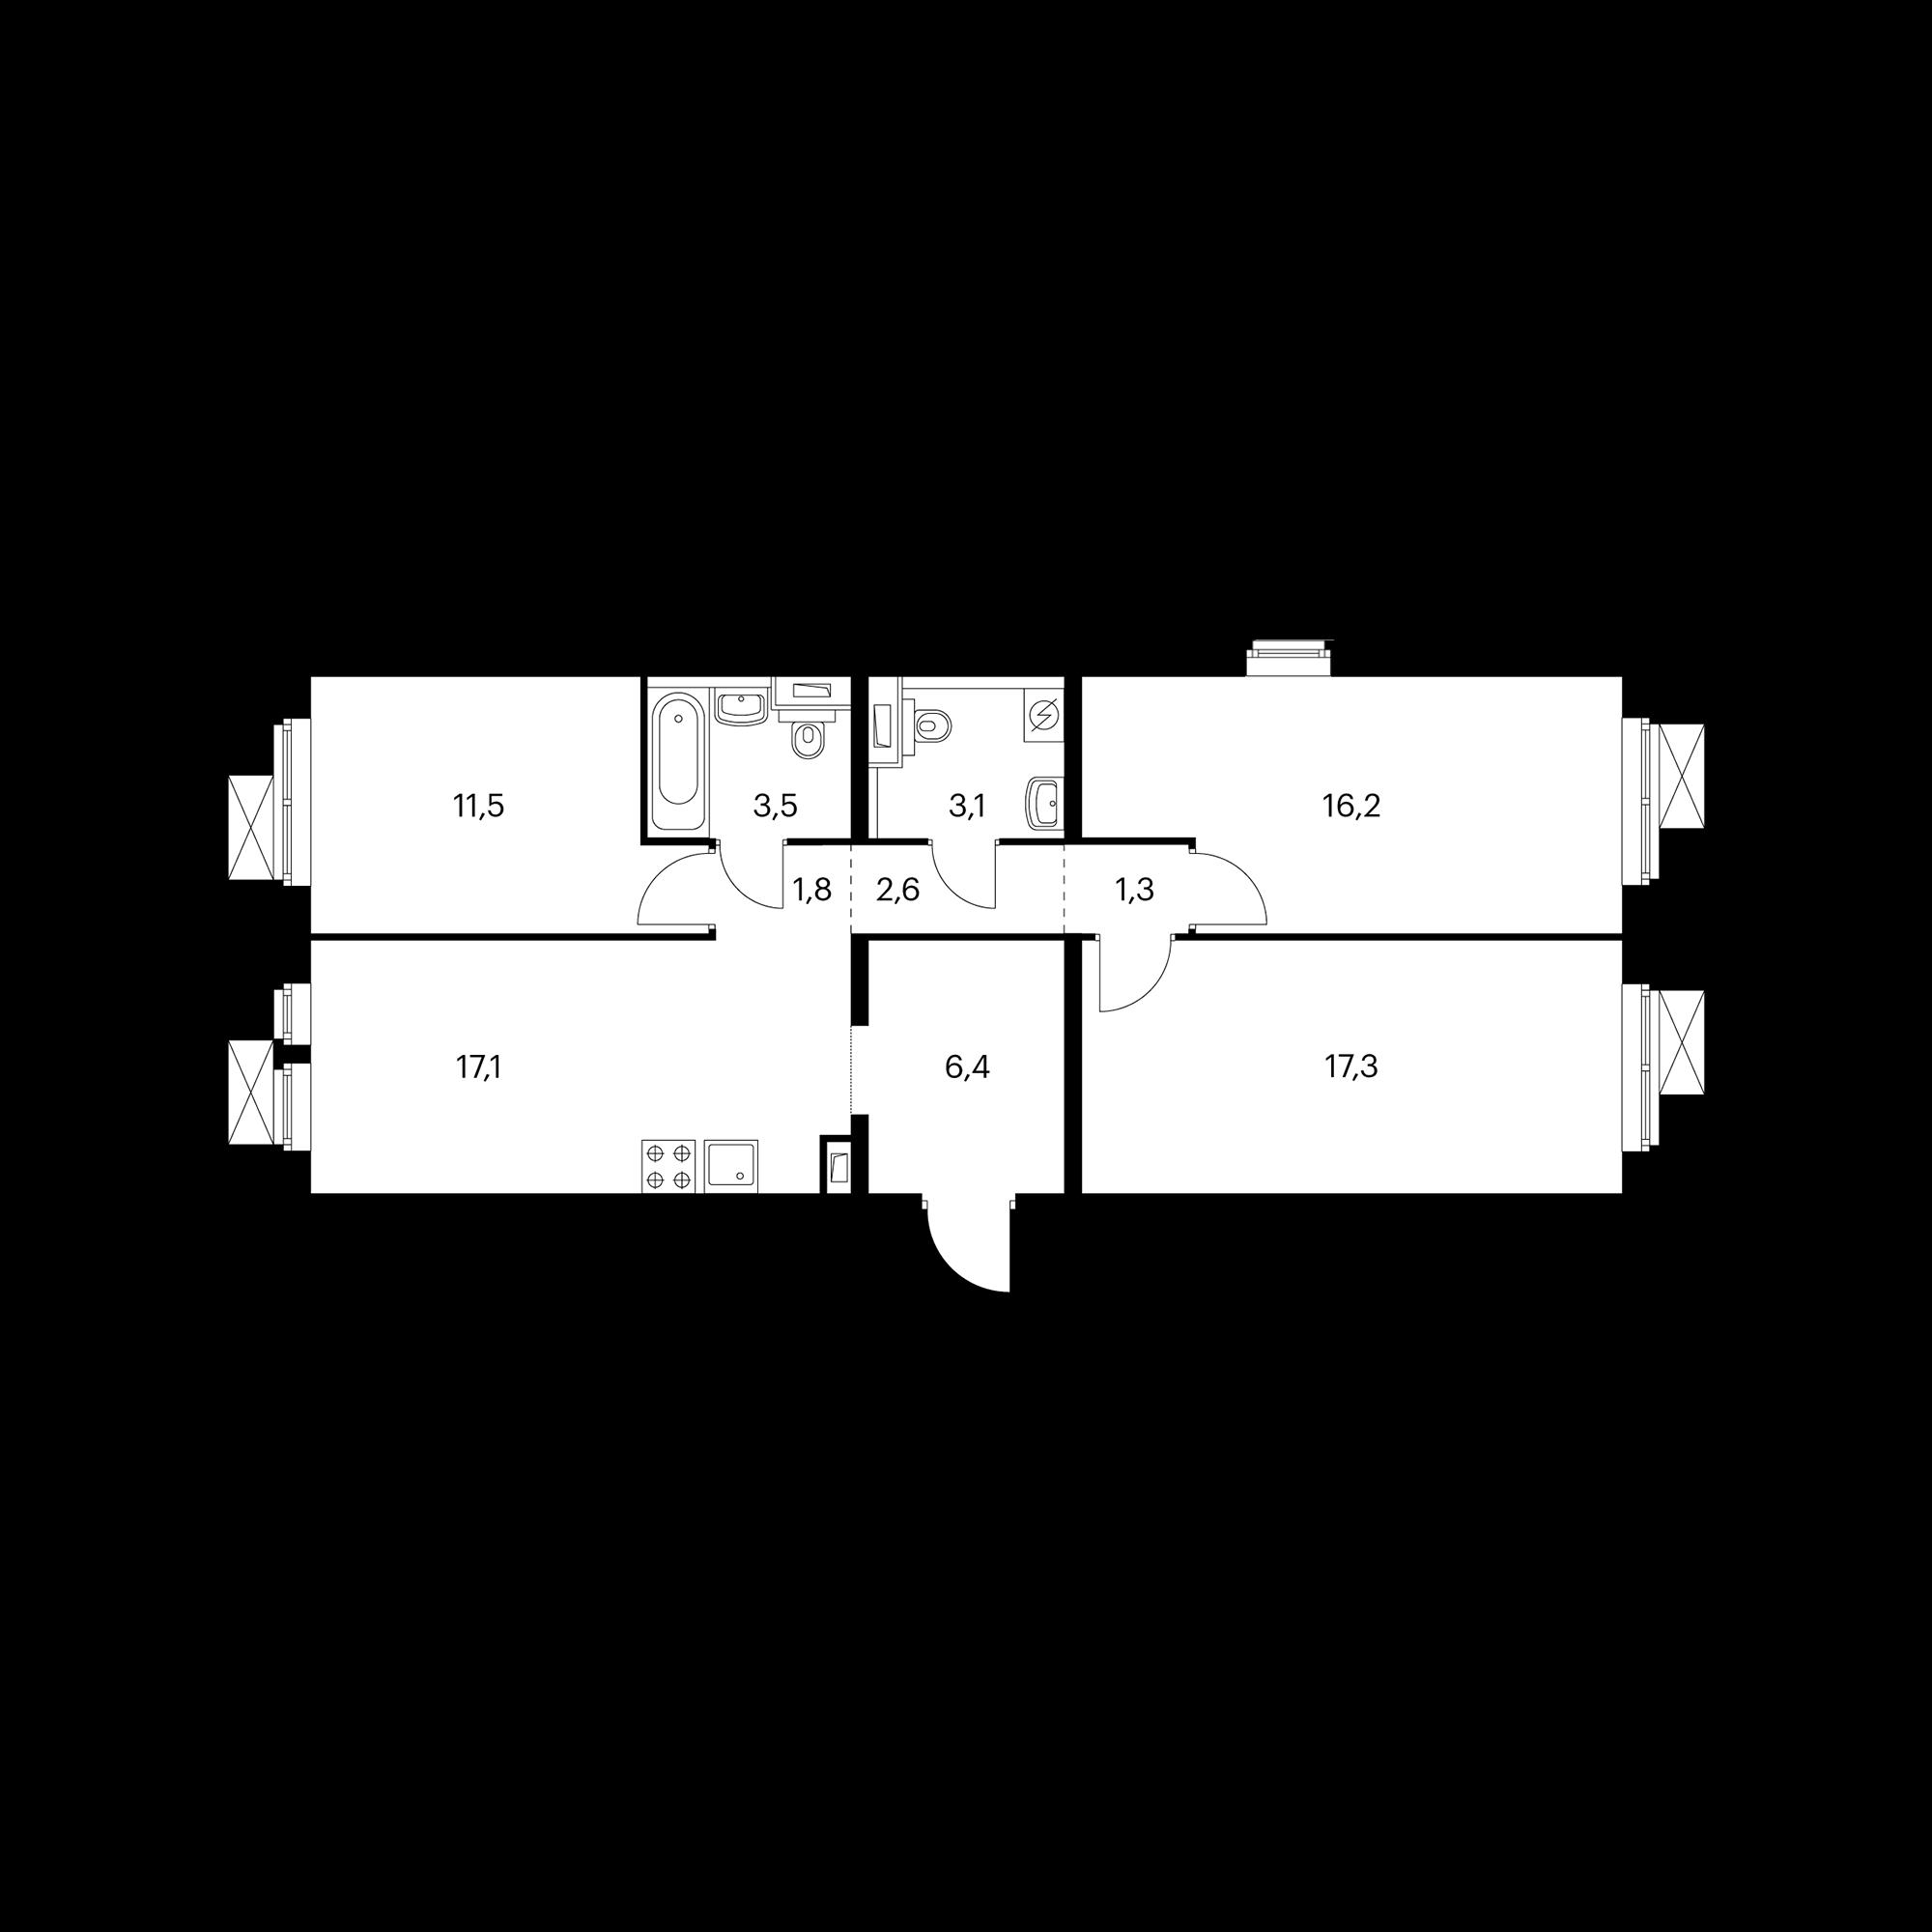 3KM16_6.0-1_S_ZT1